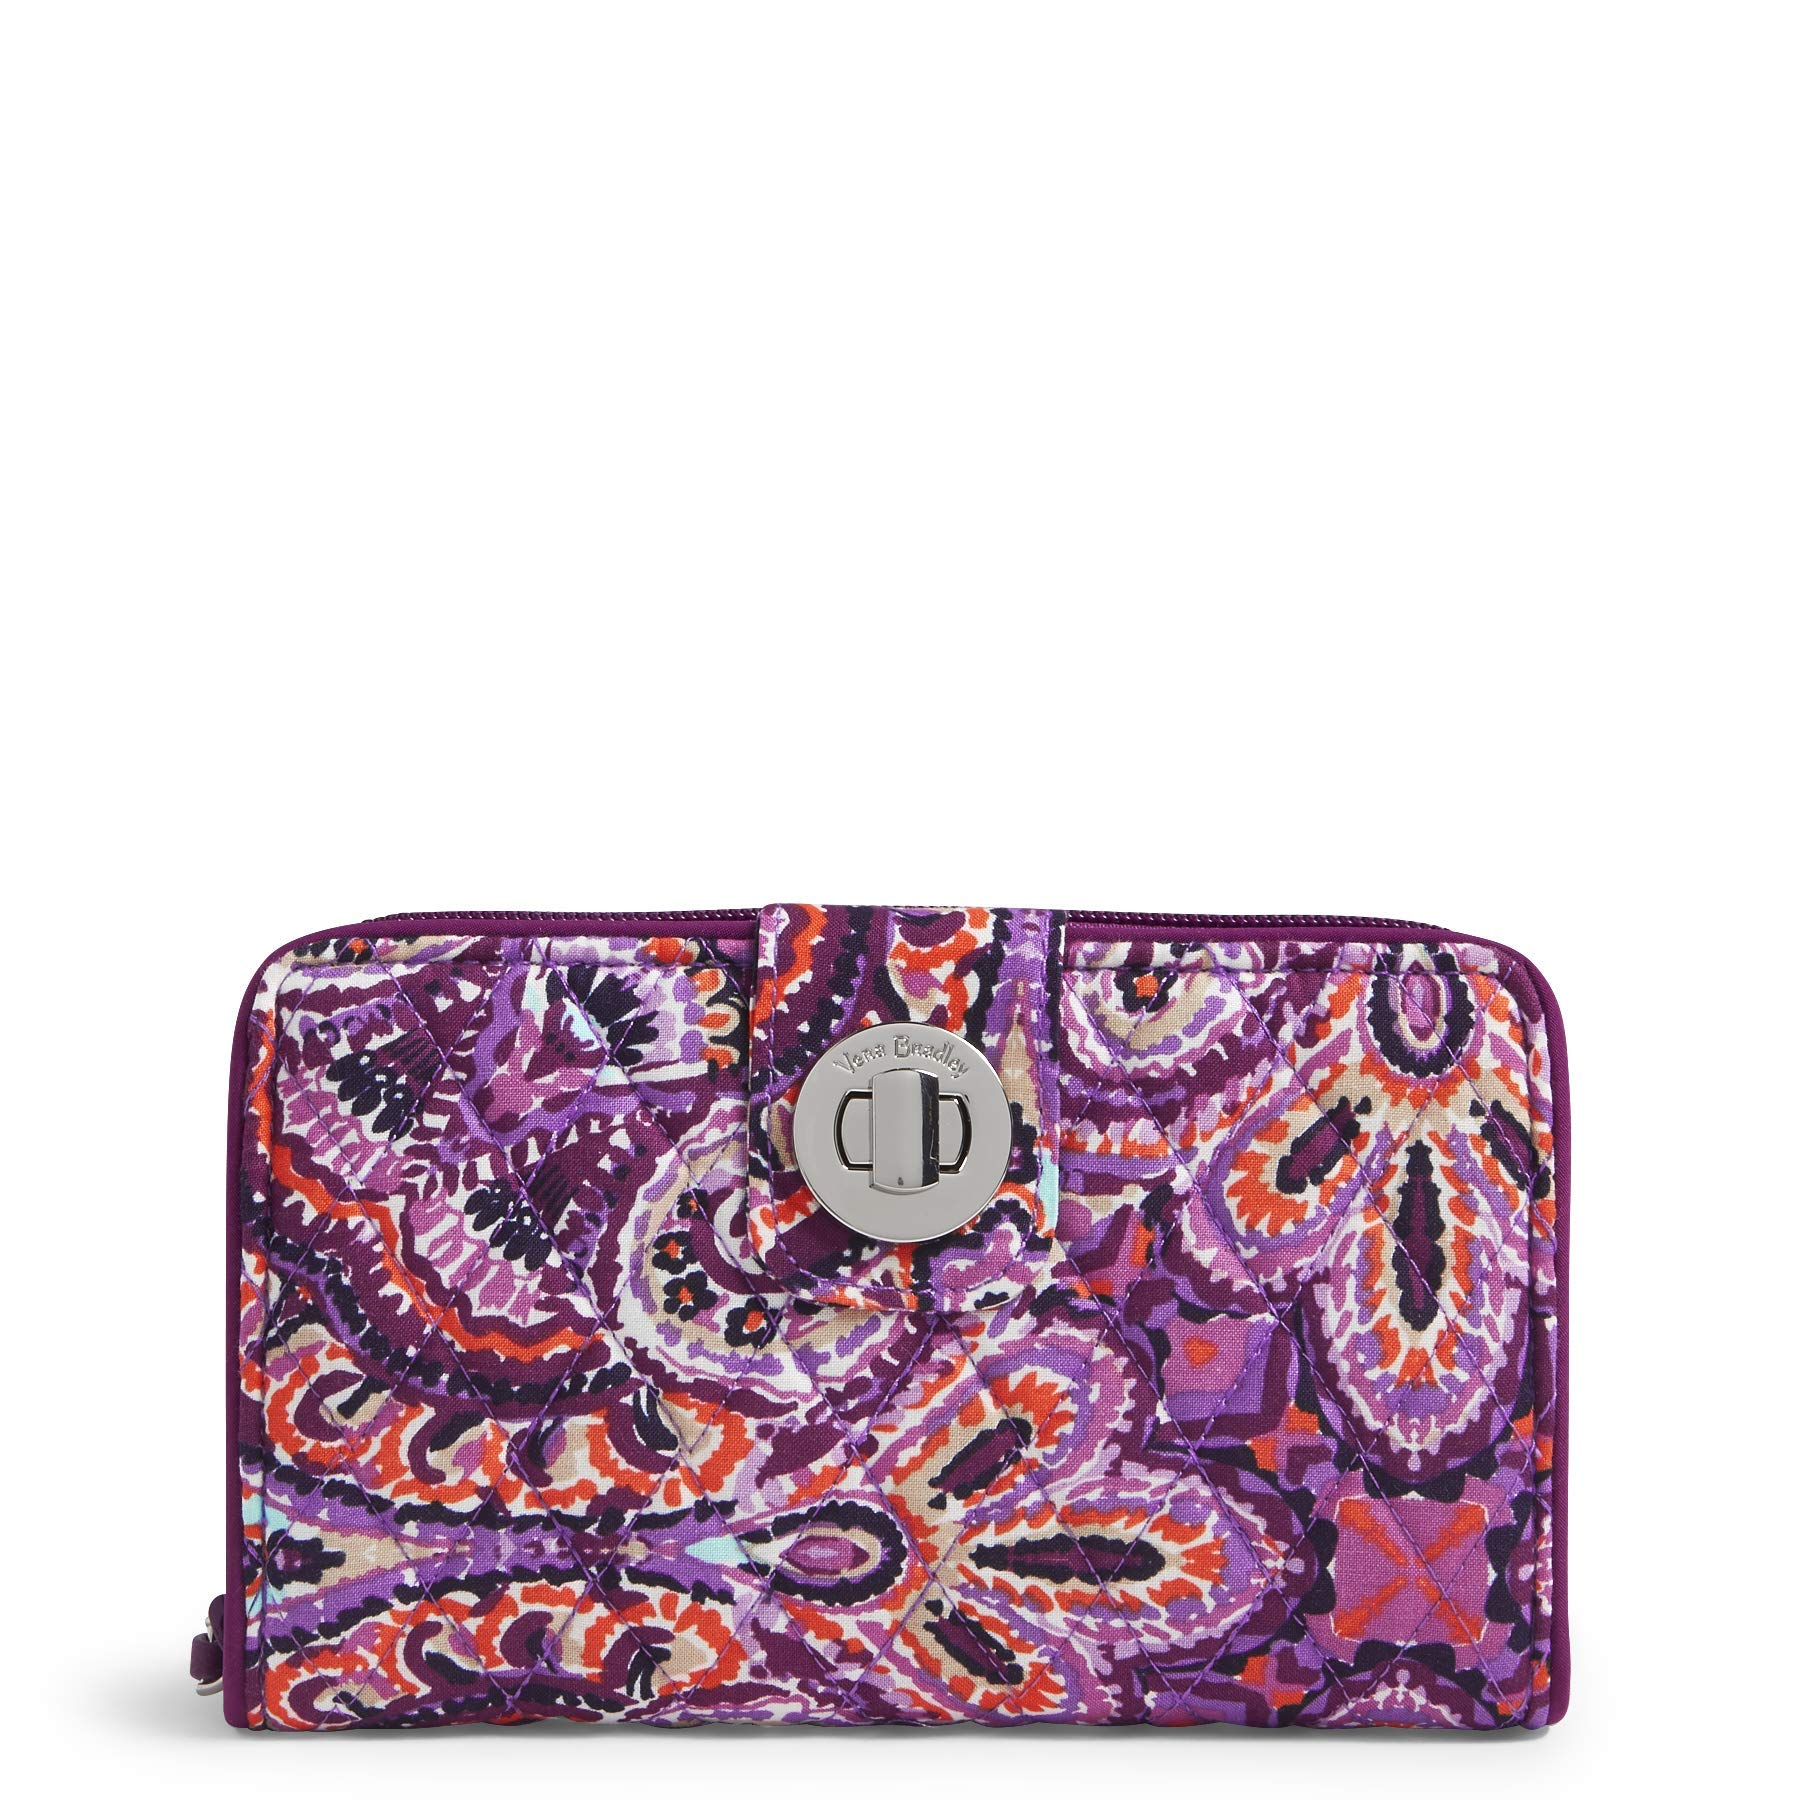 Vera Bradley RFID Turnlock Wallet, Signature Cotton, dream tapestry